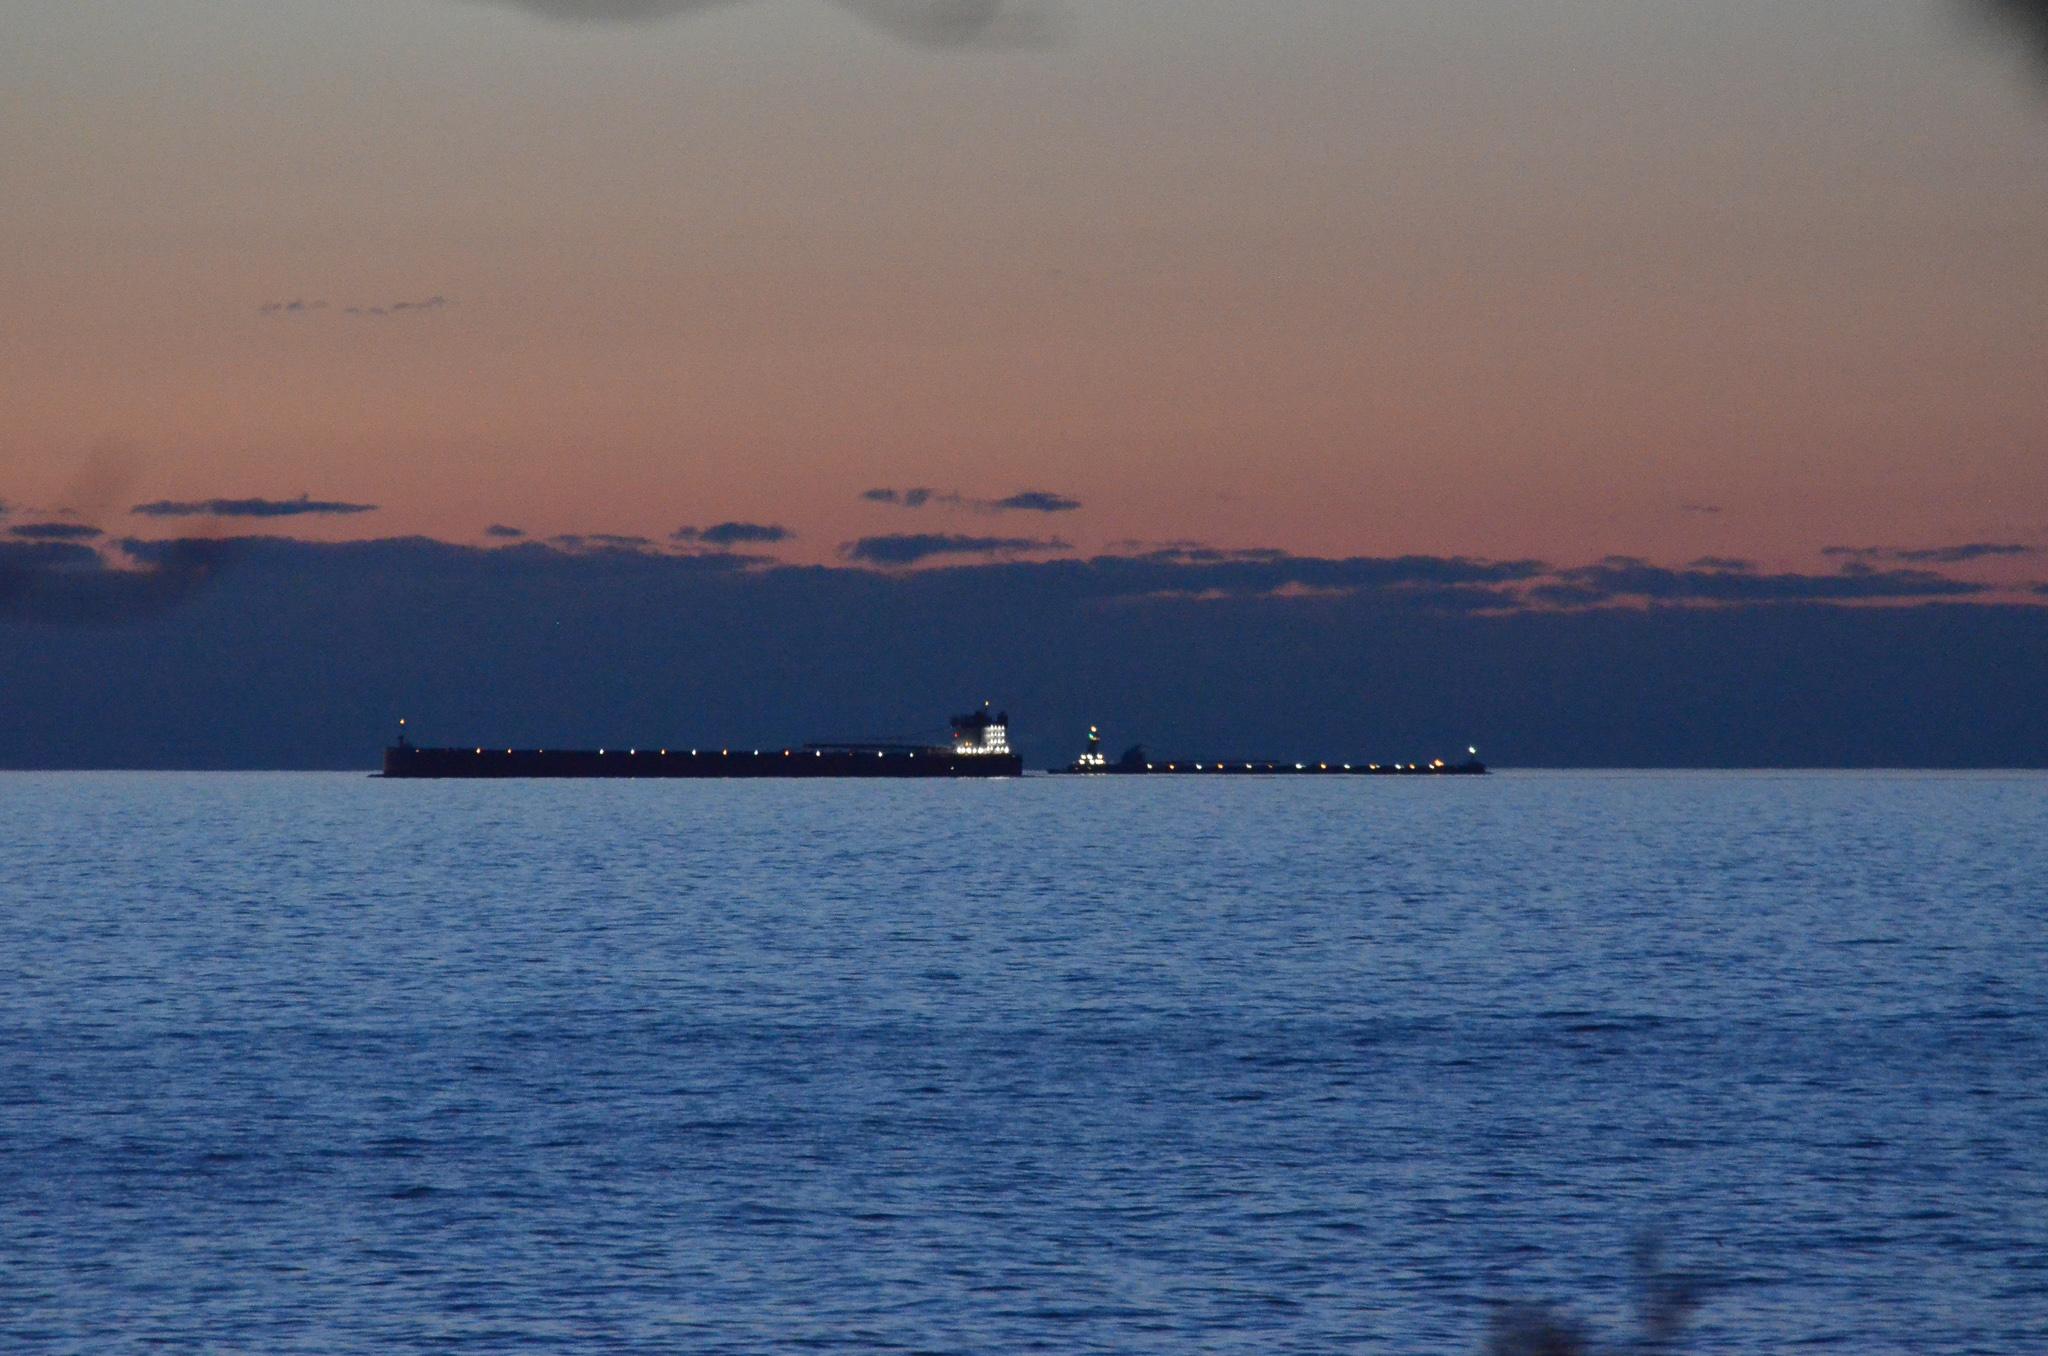 freighters-near-true-north-cabin.jpg